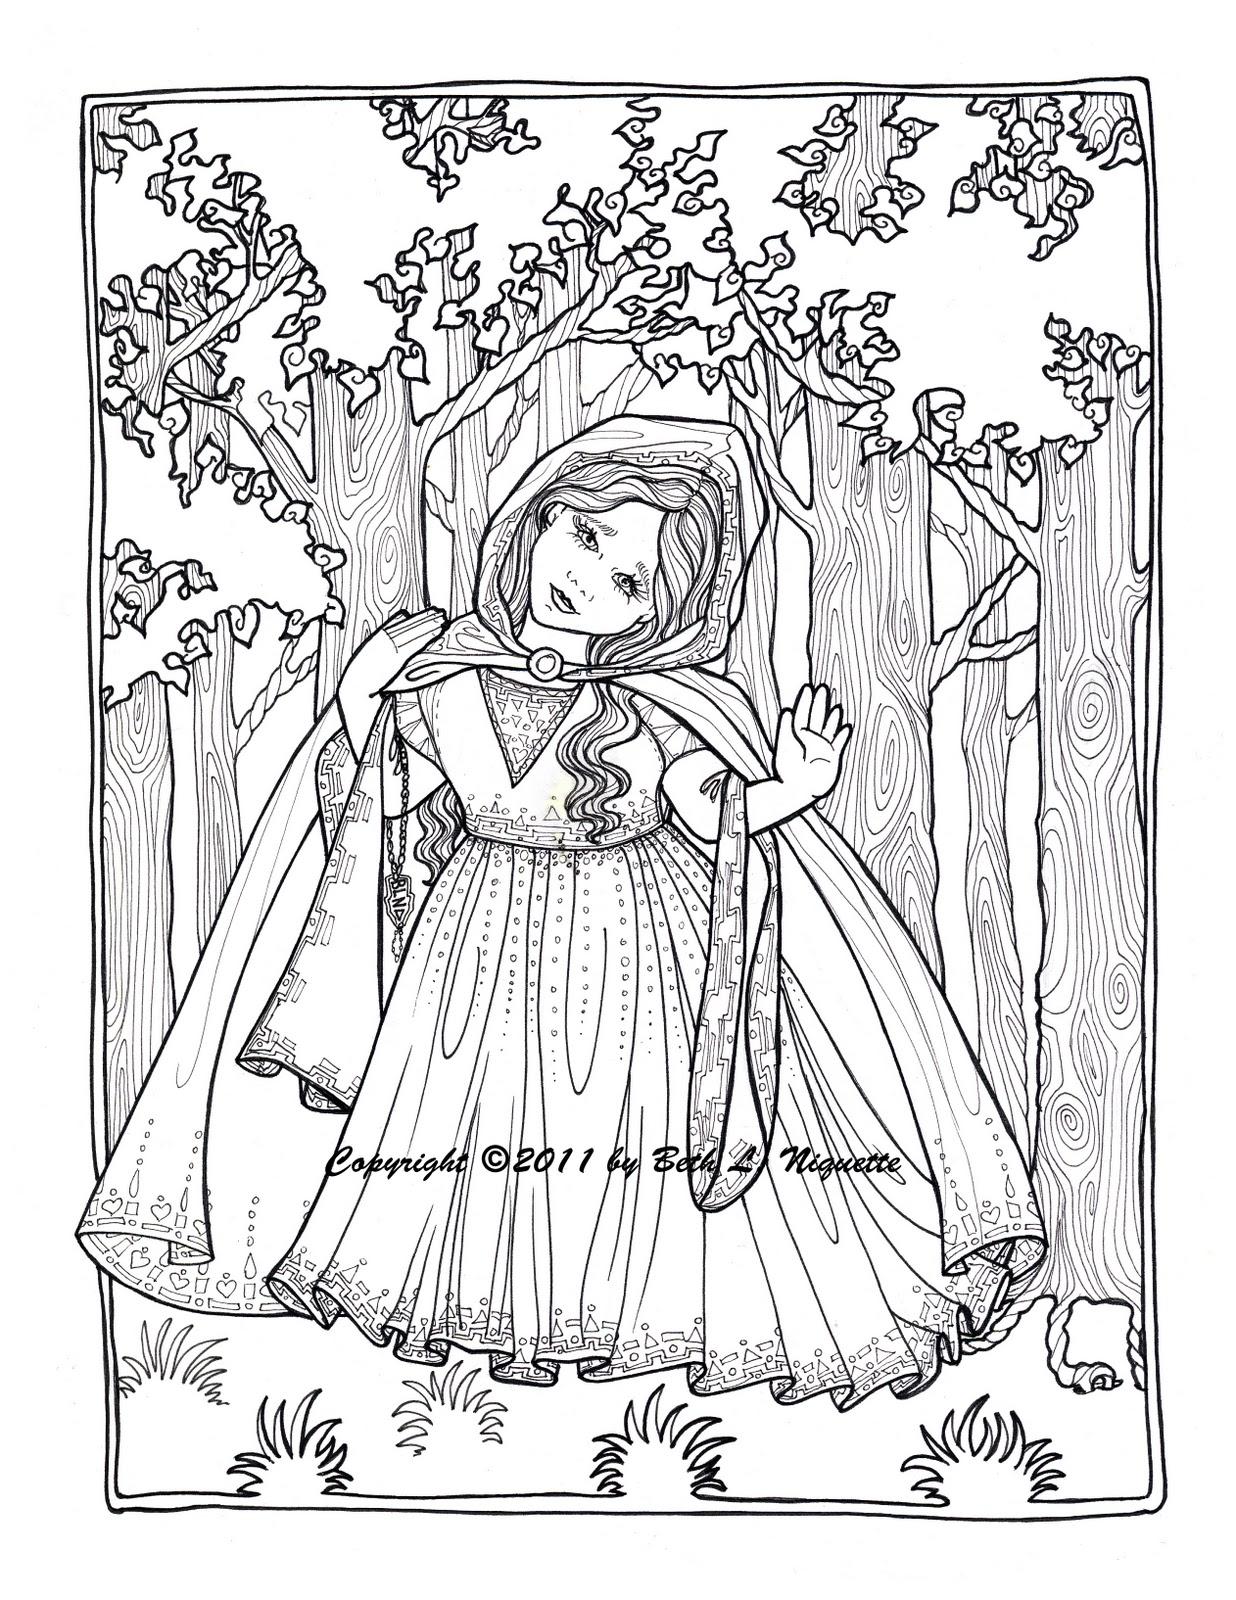 1236x1600 Beth's Artworx Little Red Riding Hood